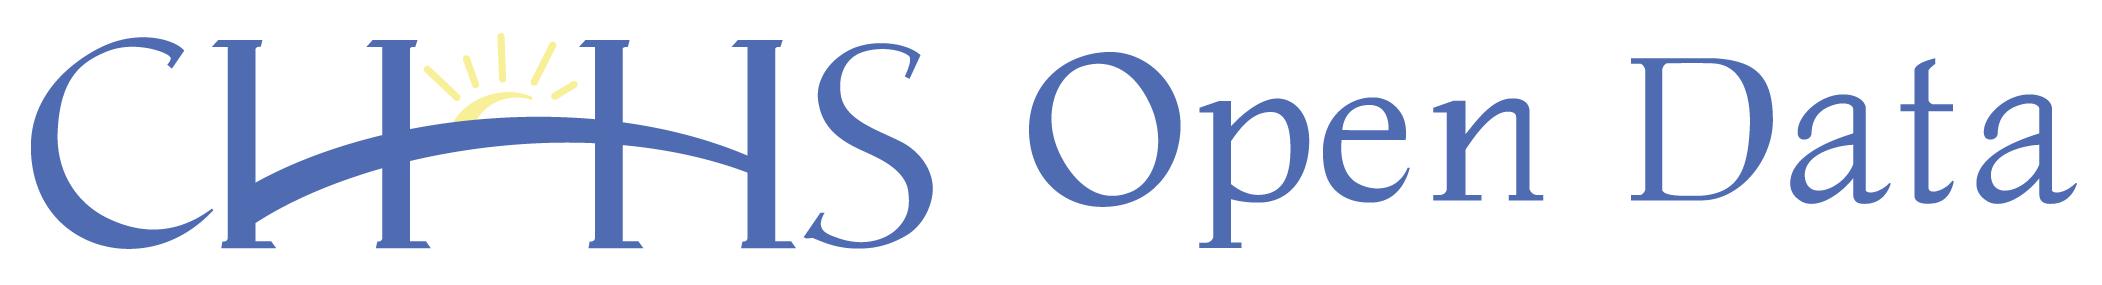 California Health and Human Services Open Data logo